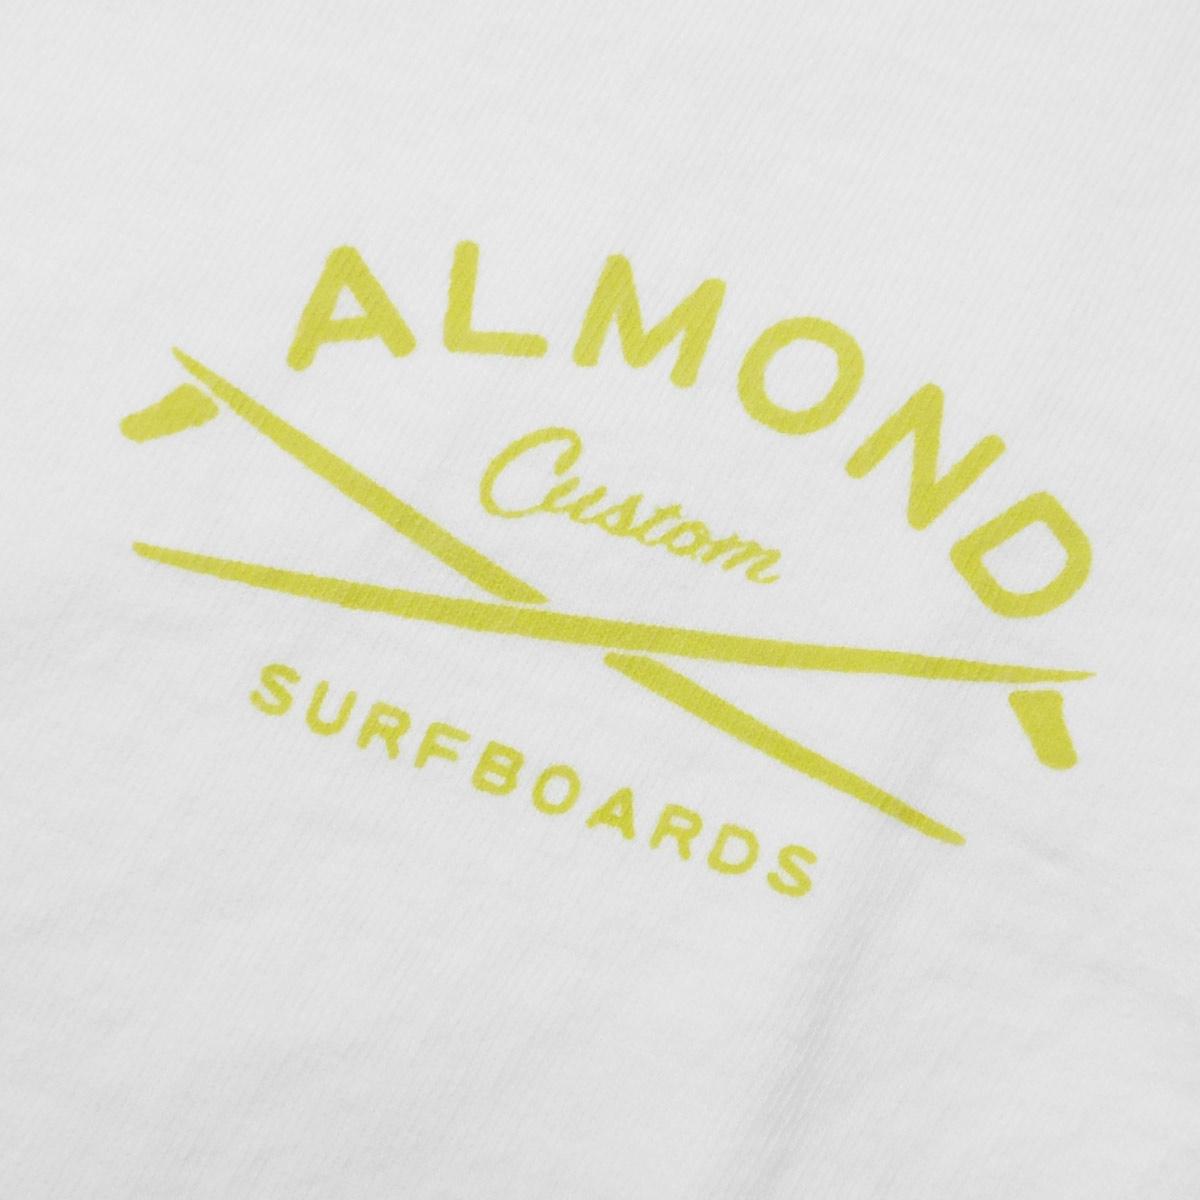 Almond Surf アーモンドサーフボードデザイン CUCTUS S/S TEE